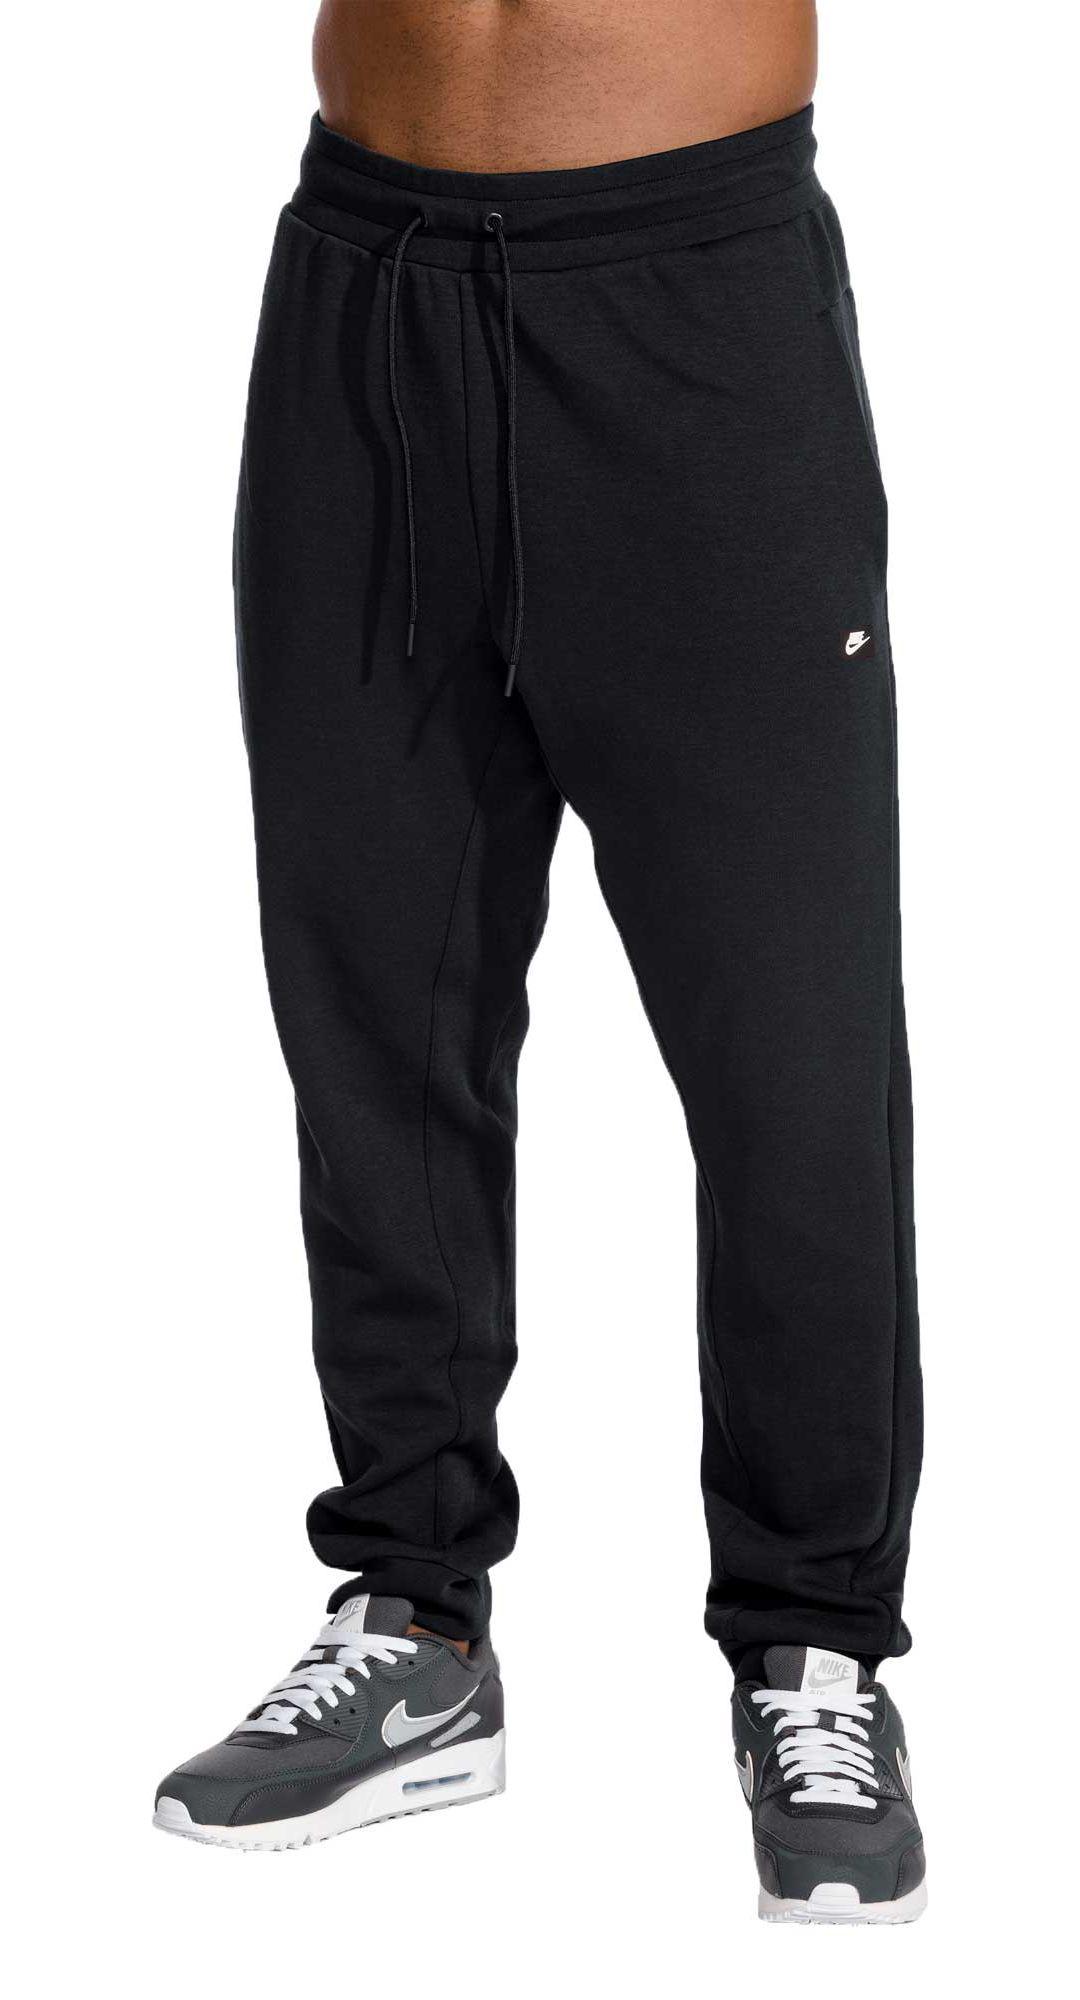 94ce91a83068 Nike Men's Sportswear Optic Jogger Pants   DICK'S Sporting Goods